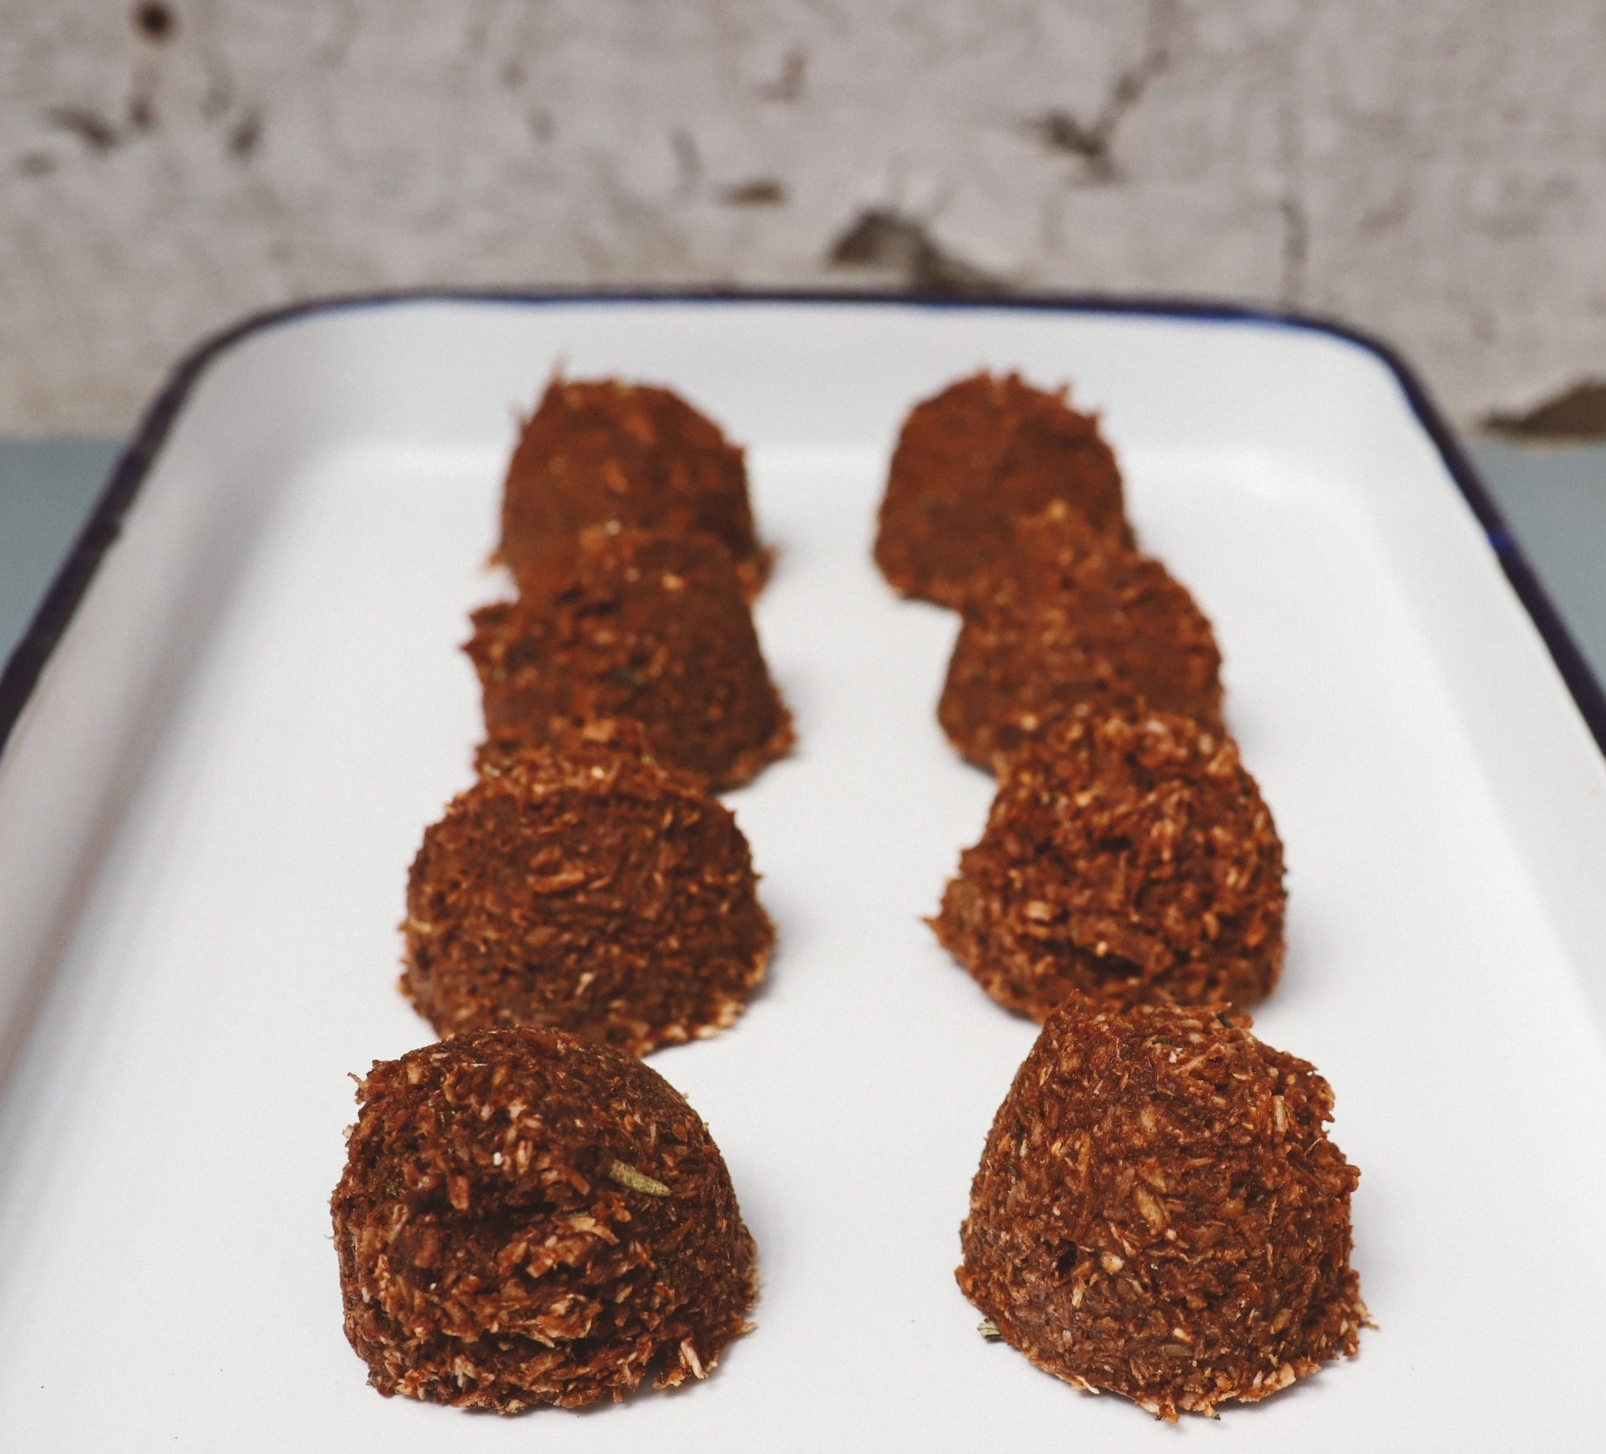 solfeggio-chocolaterosemarymacaroon-17.jpg